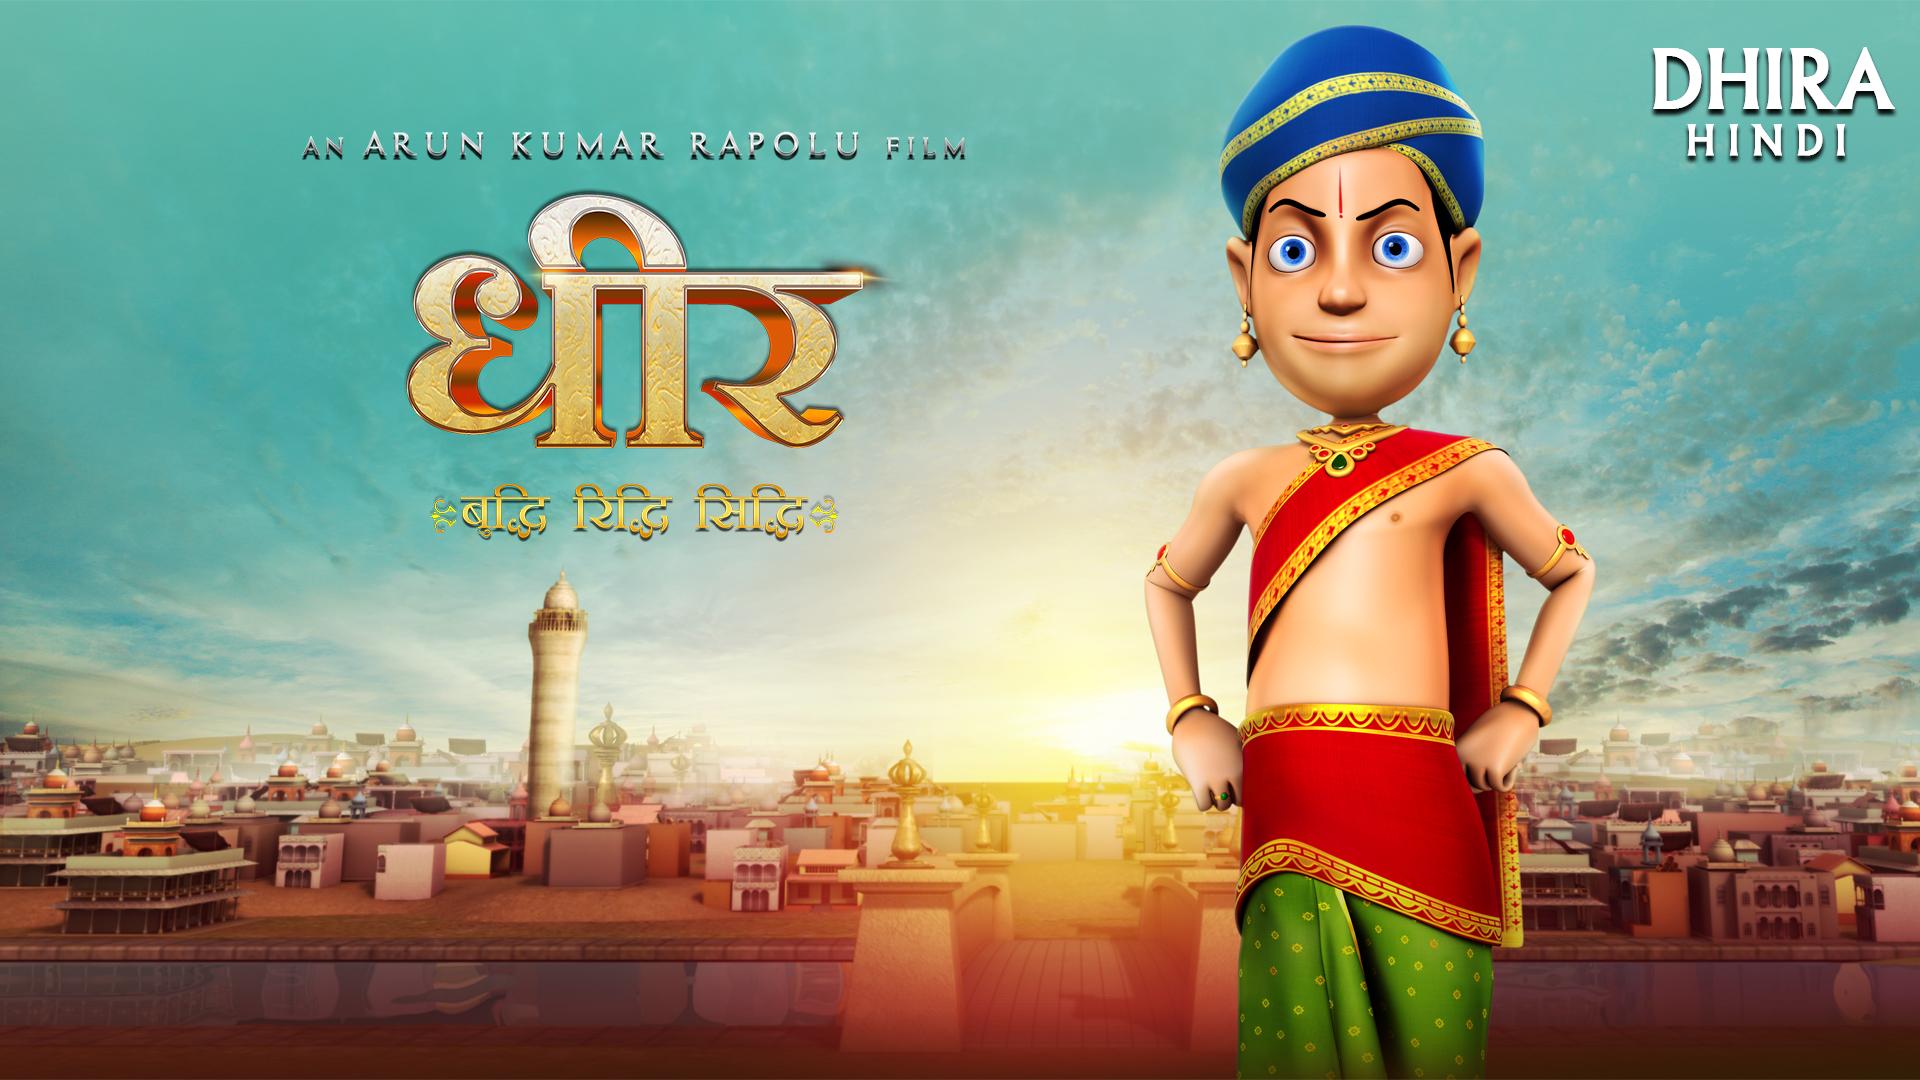 Dhira (Hindi)